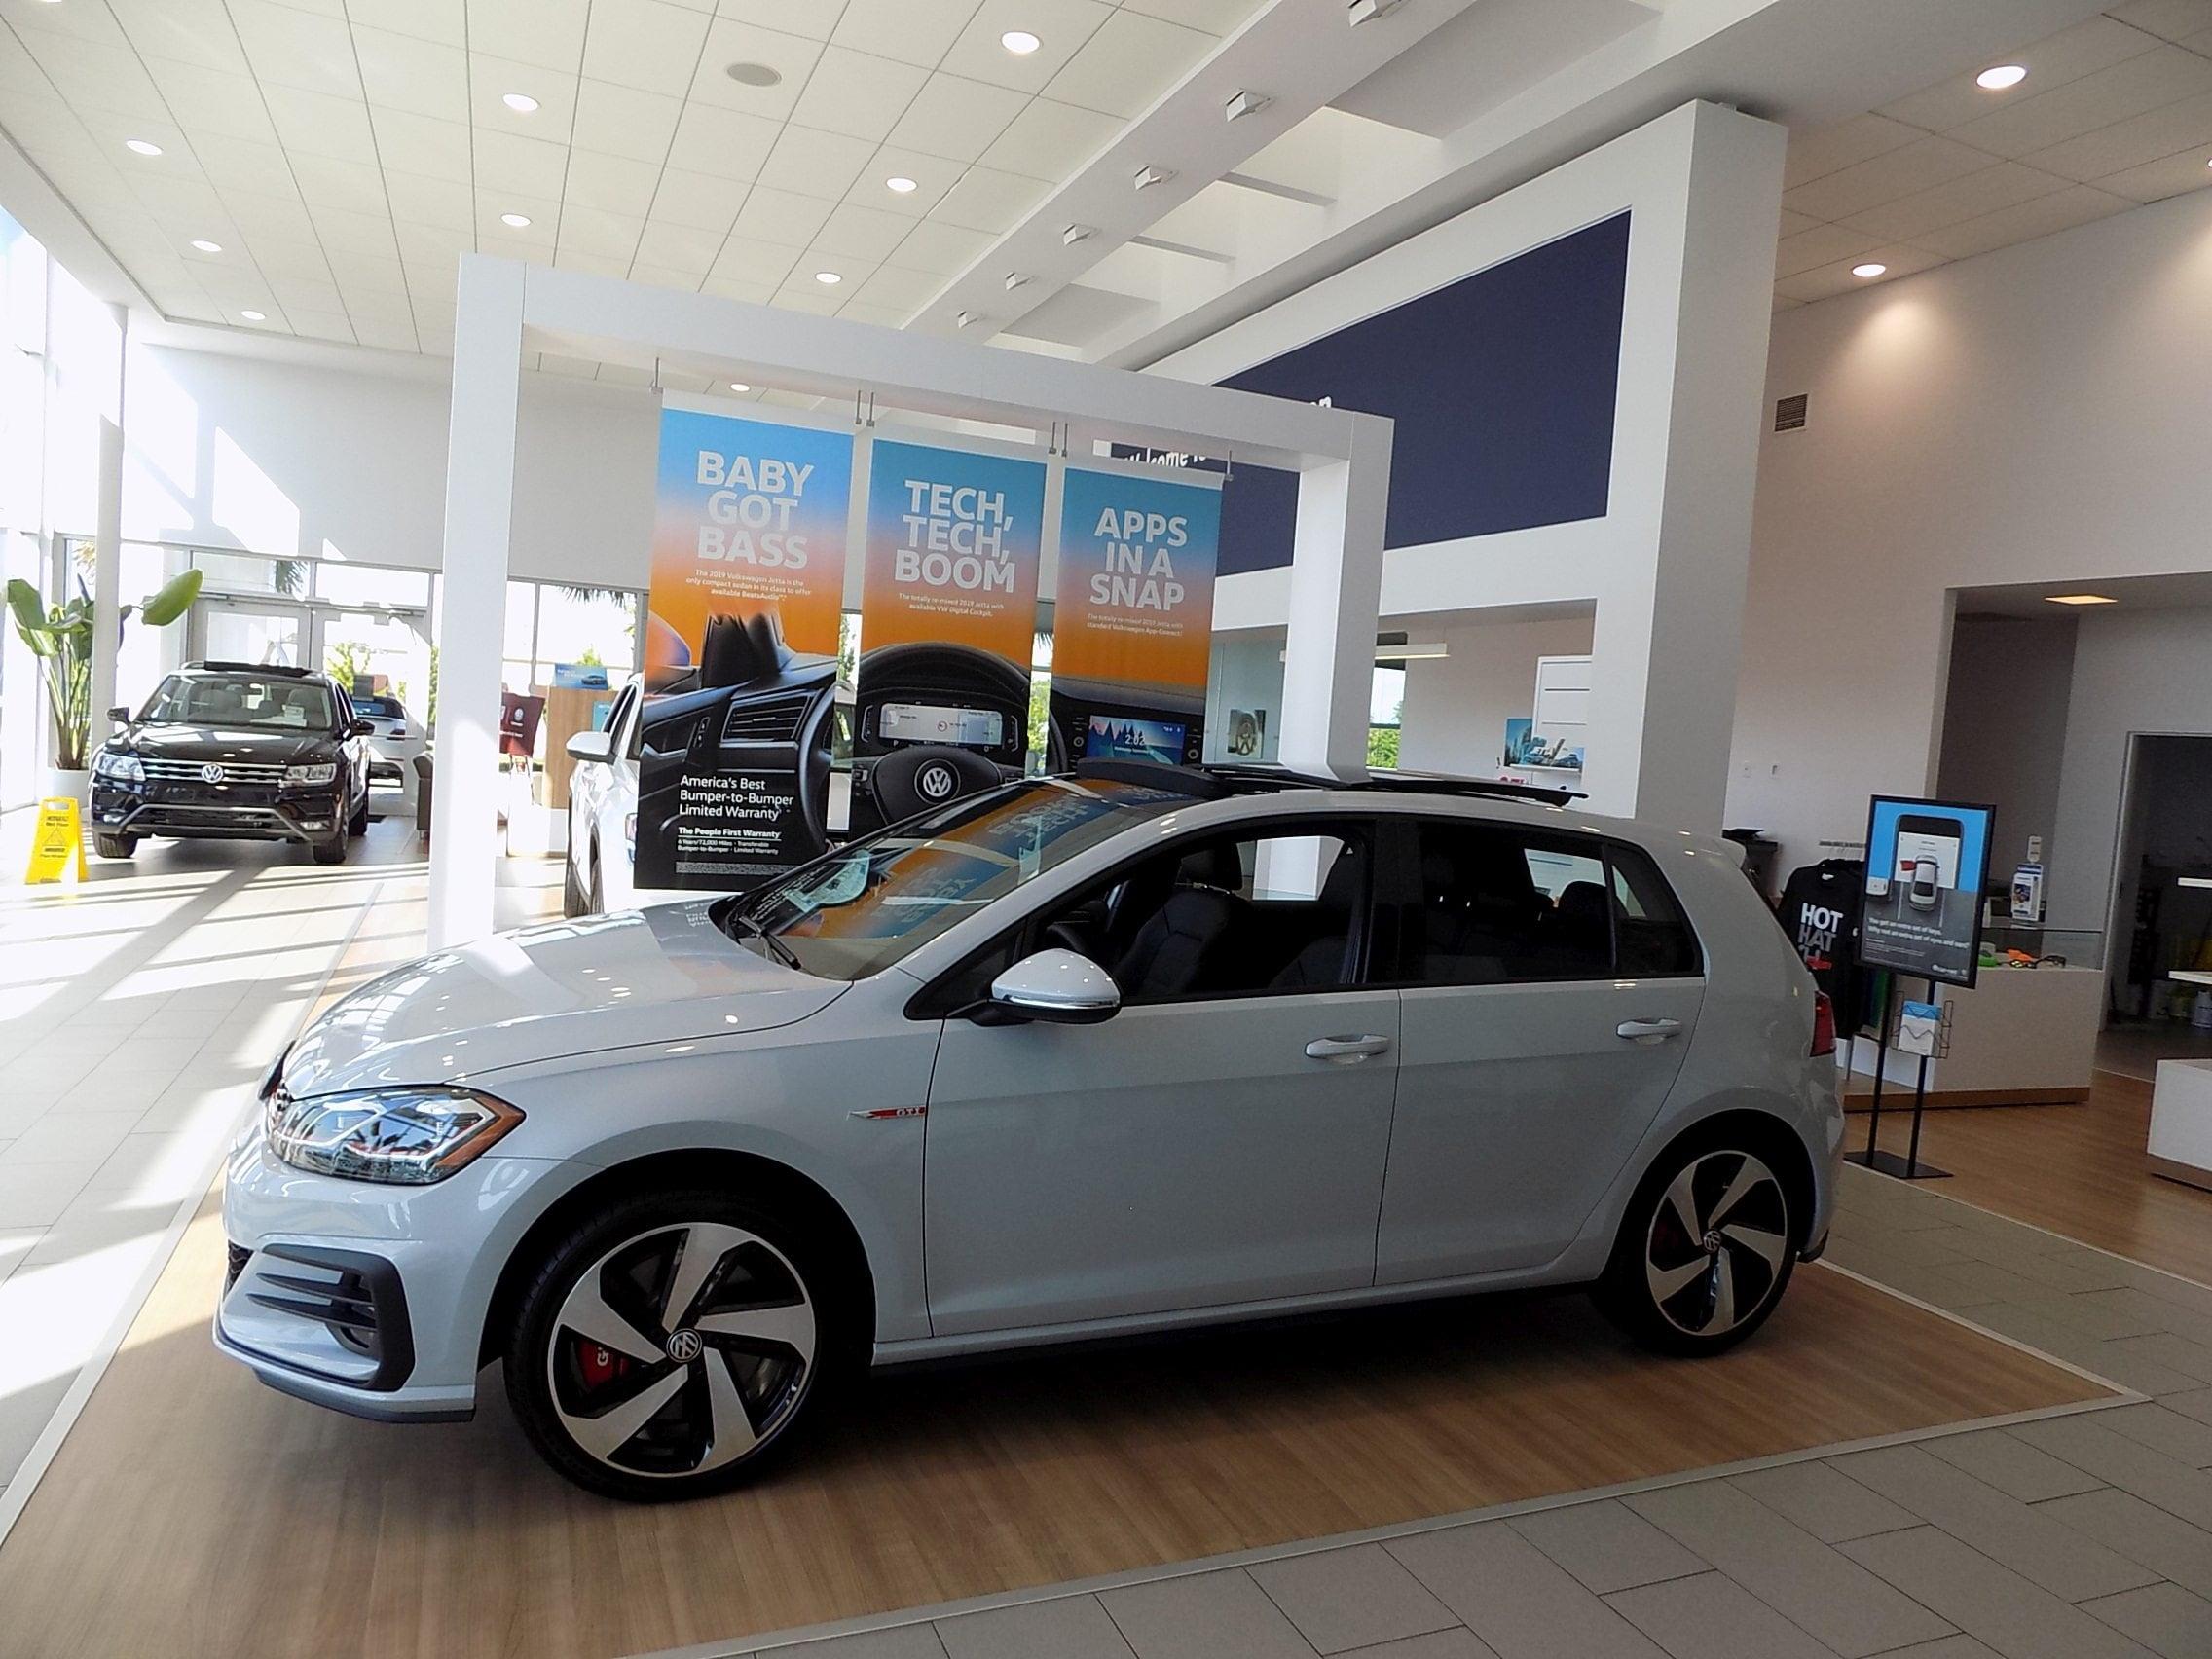 Car Dealerships In Sumter Sc >> Volkswagen Dealership In Columbia Sc Mcdaniels Vw New Used Vw Cars